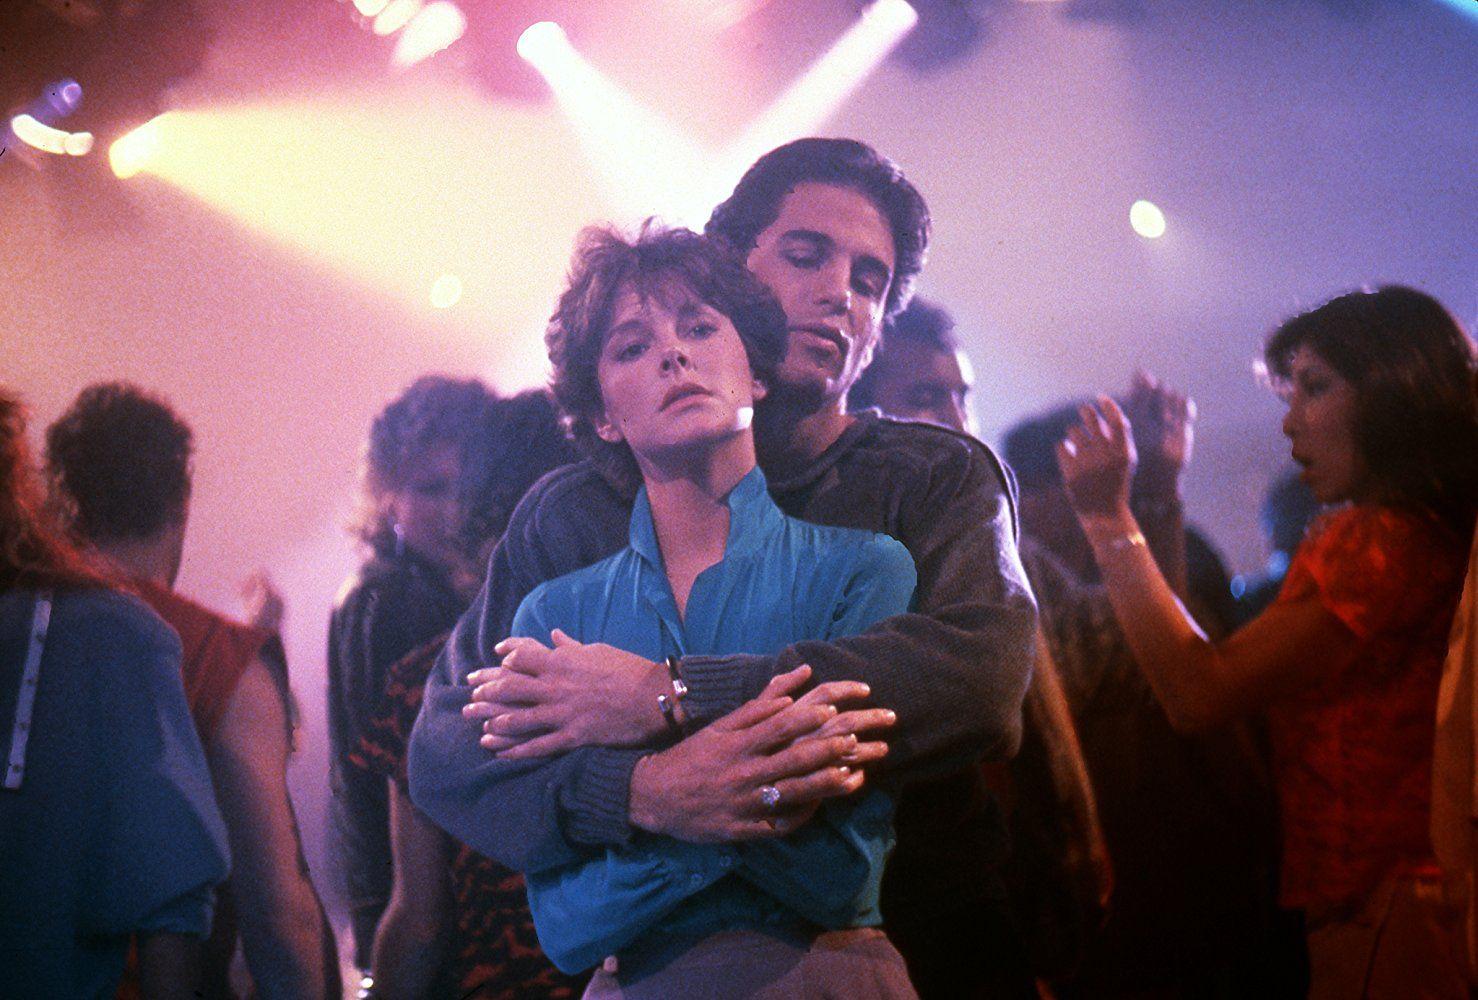 Amanda Bearse Pictures fright night (1985) - photo gallery - imdb, amanda bearse